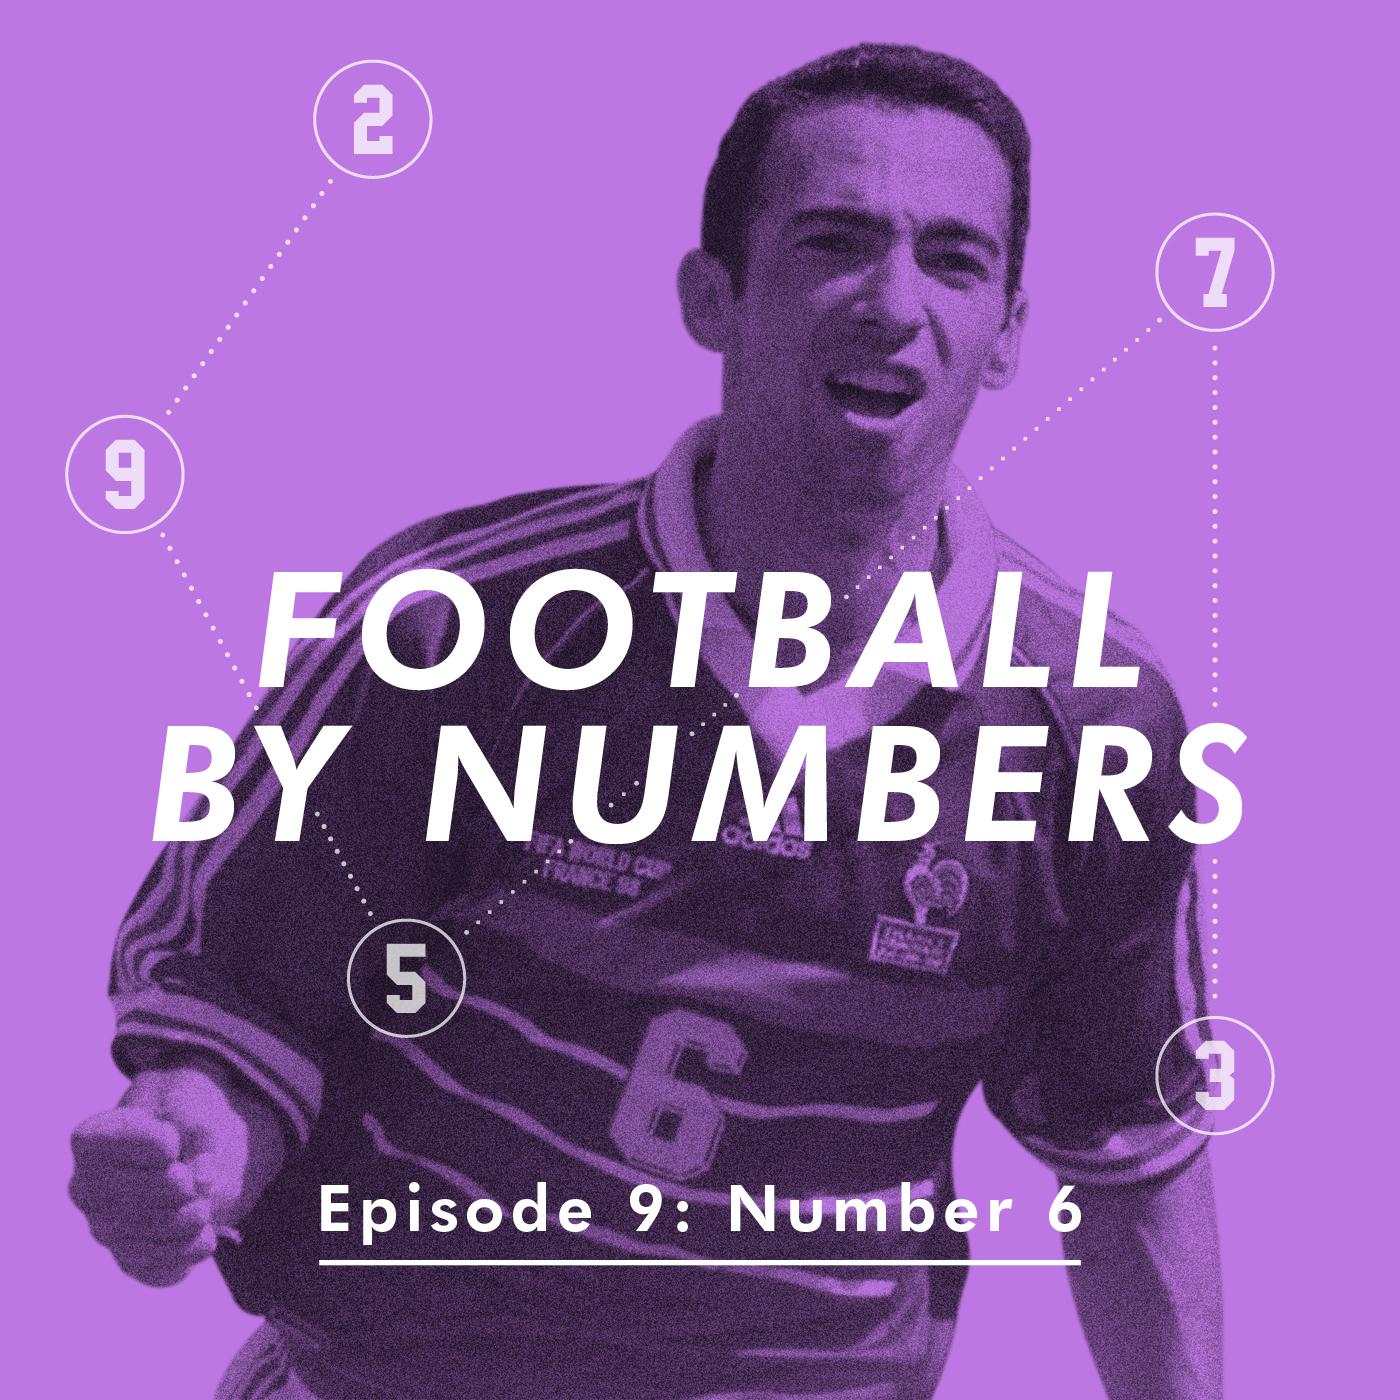 FootballByNumbers-Covers-E9.jpg